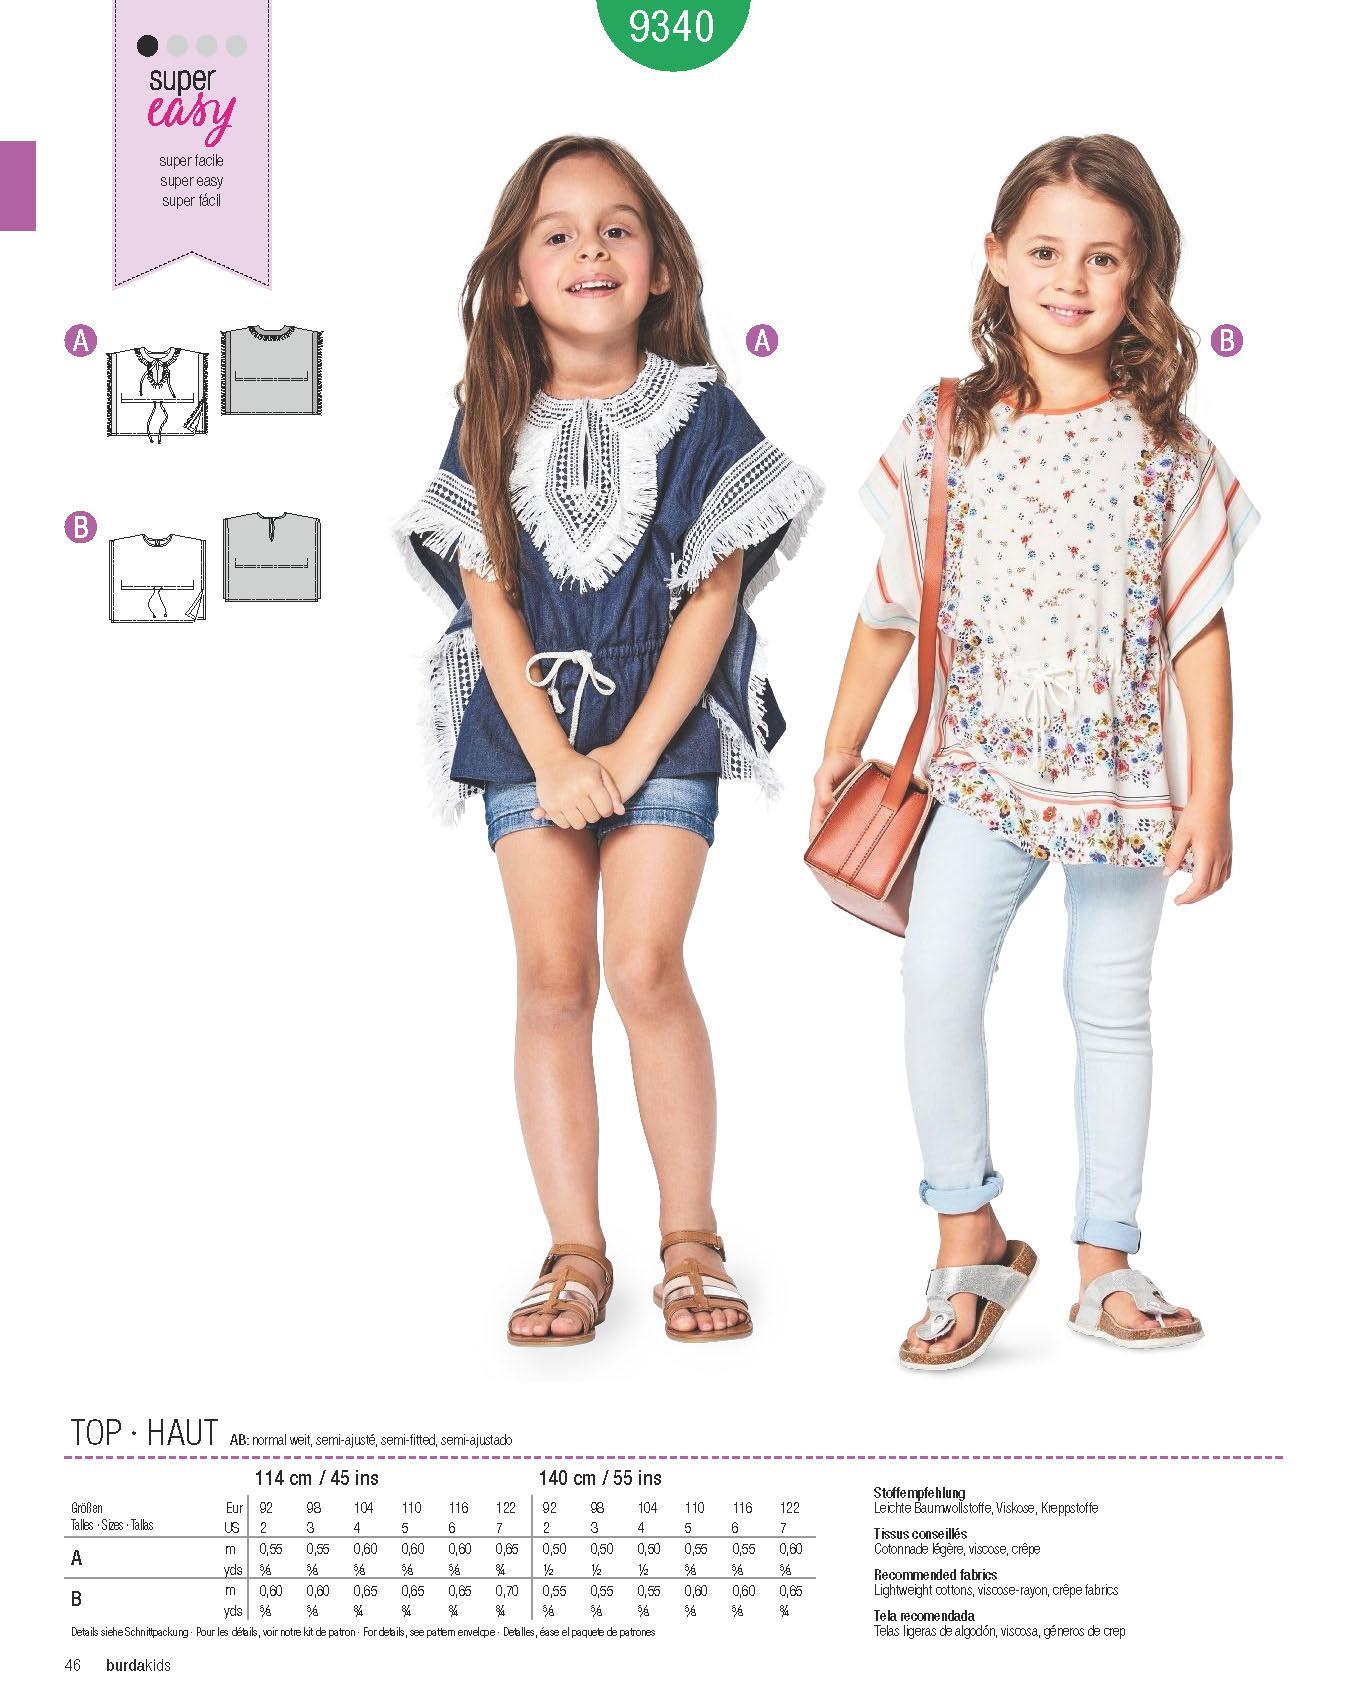 fbec653a8d3 Μόδα για μικρά παιδιά: Πατρόν Burda Kids / 9340